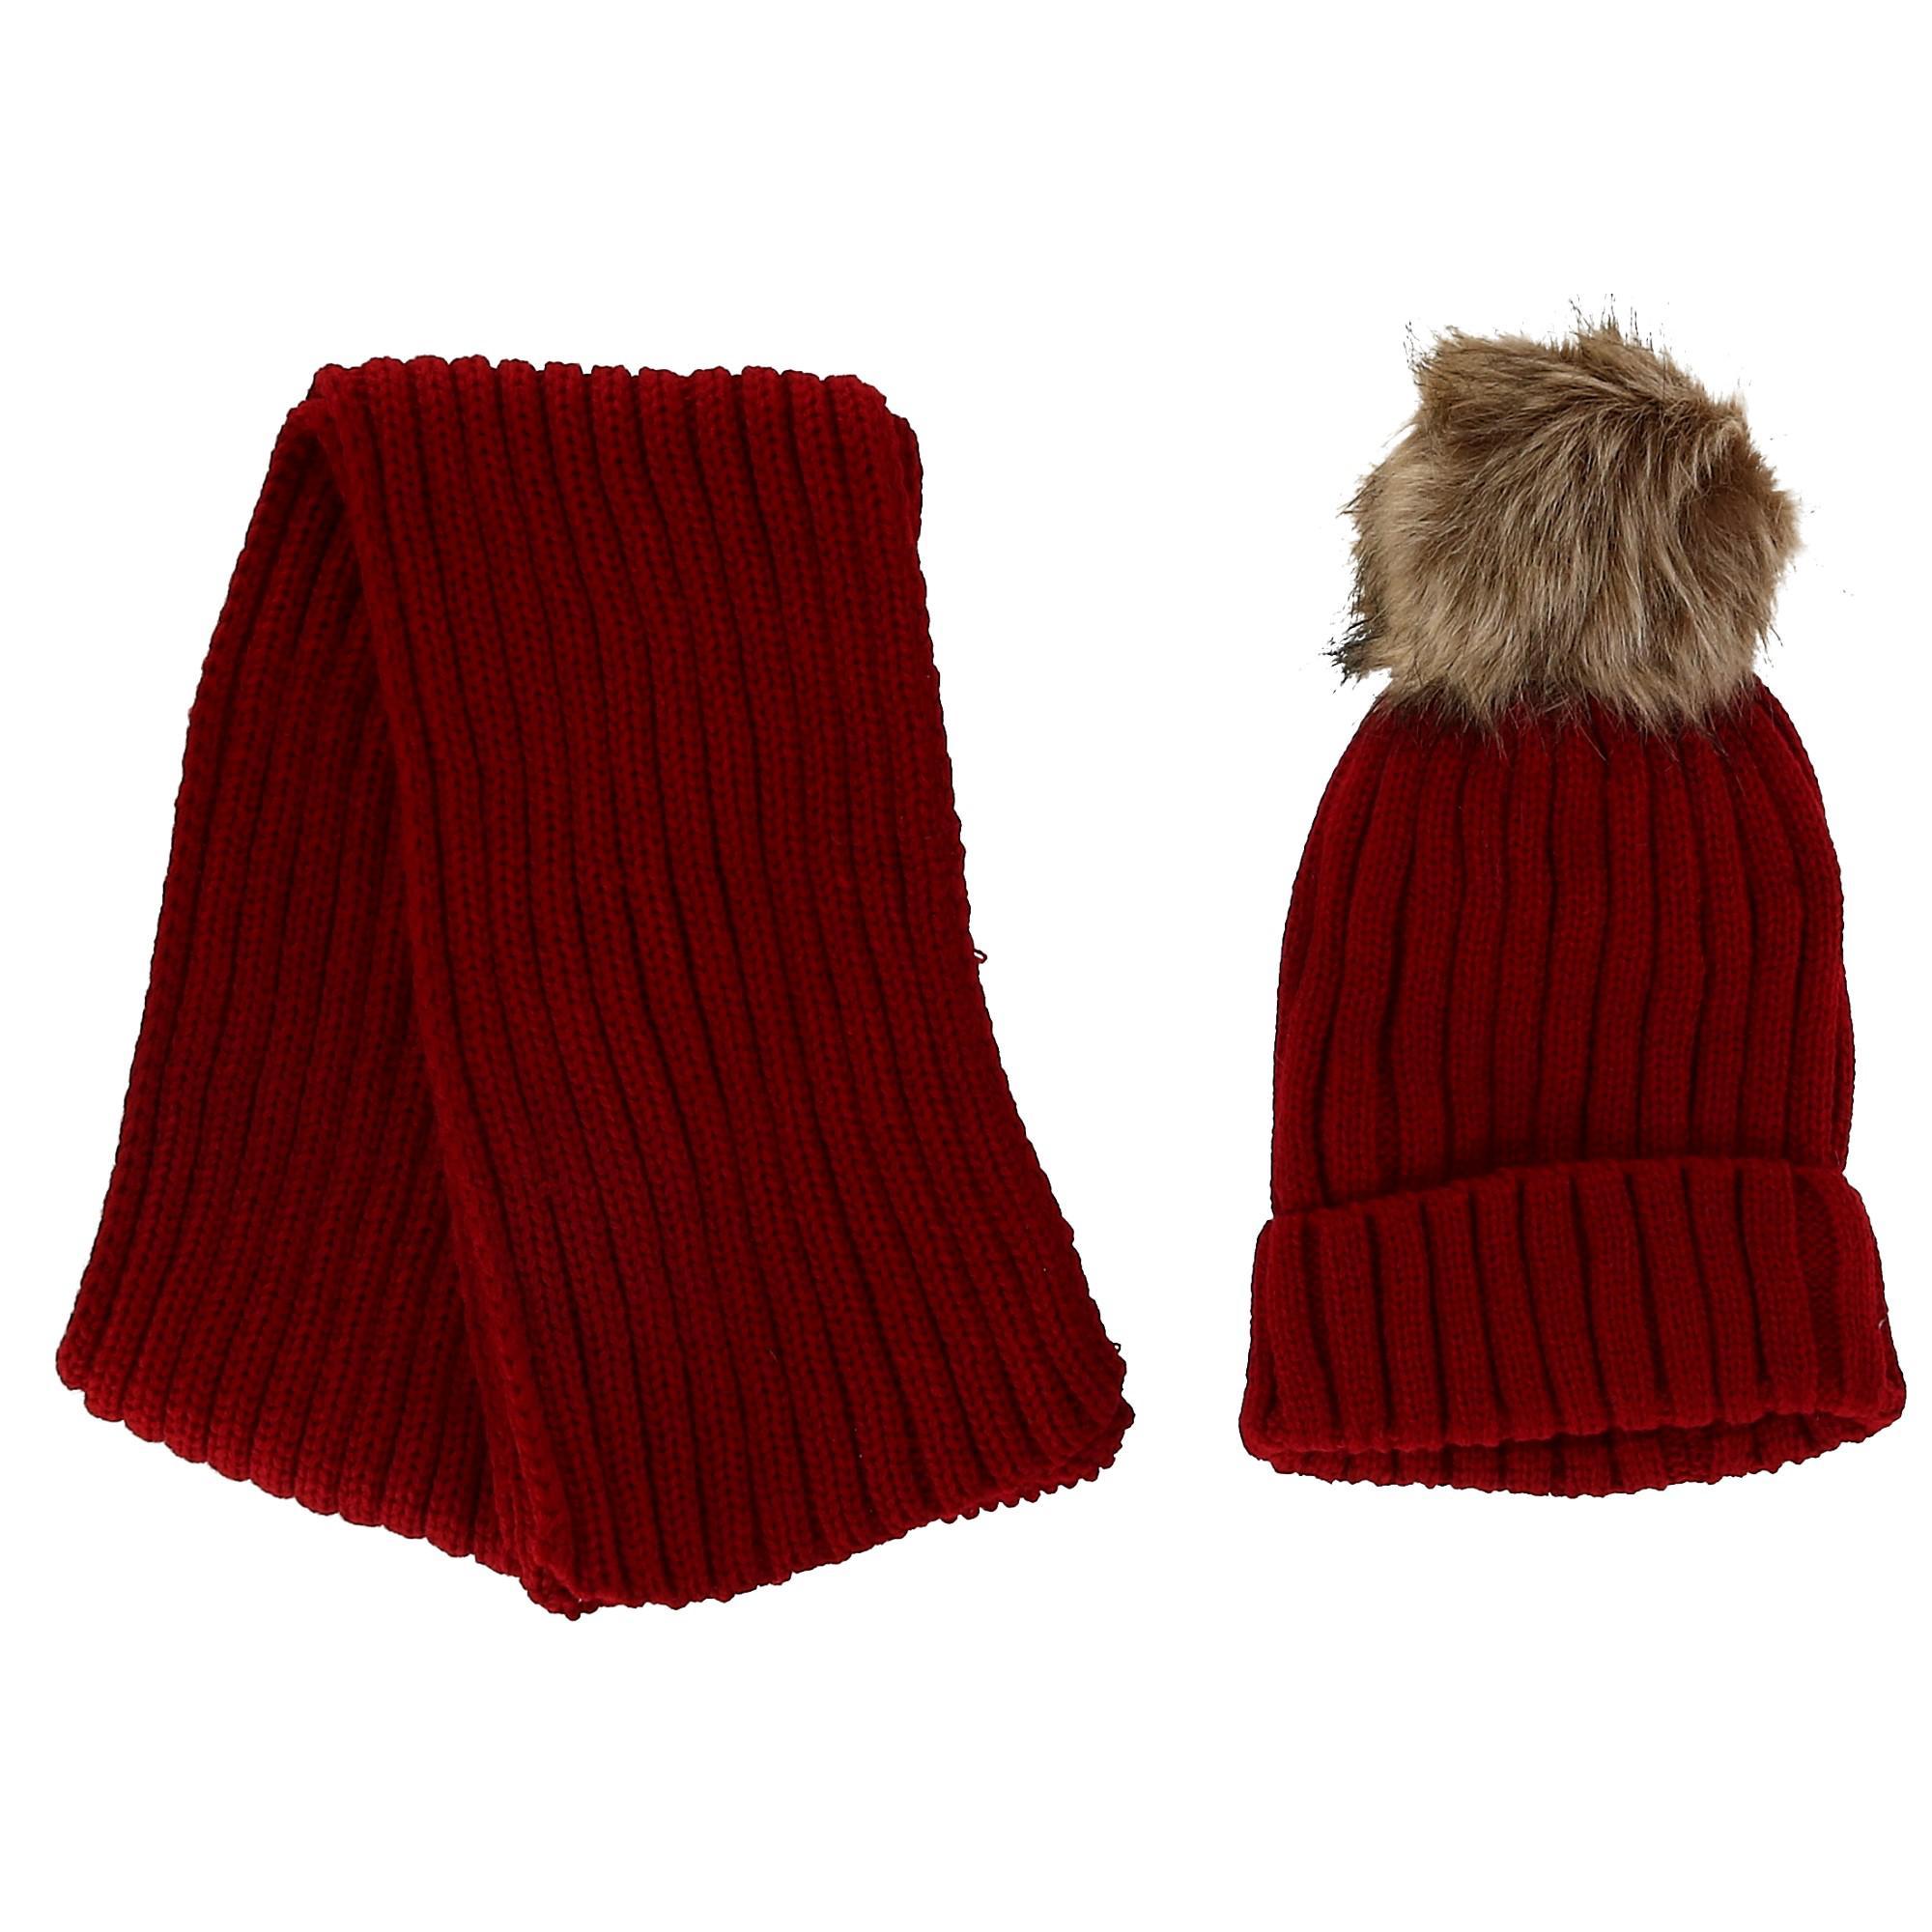 Foemo Kids' Ribbed Knit Winter Hat and